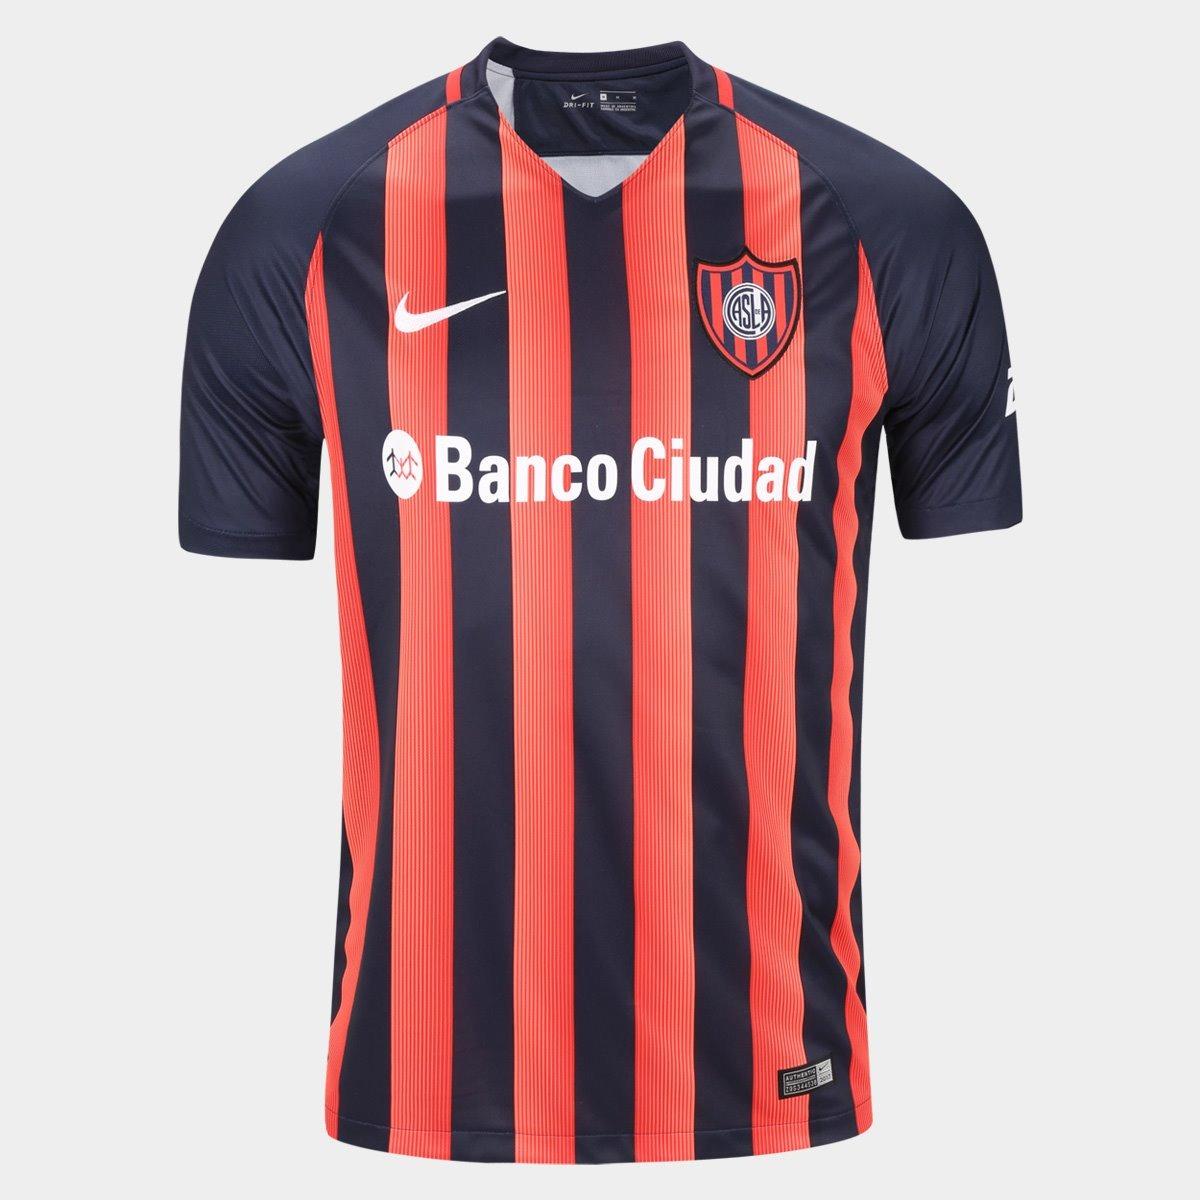 camiseta nike san lorenzo oficial stadium. Cargando zoom. 35017af59ad35